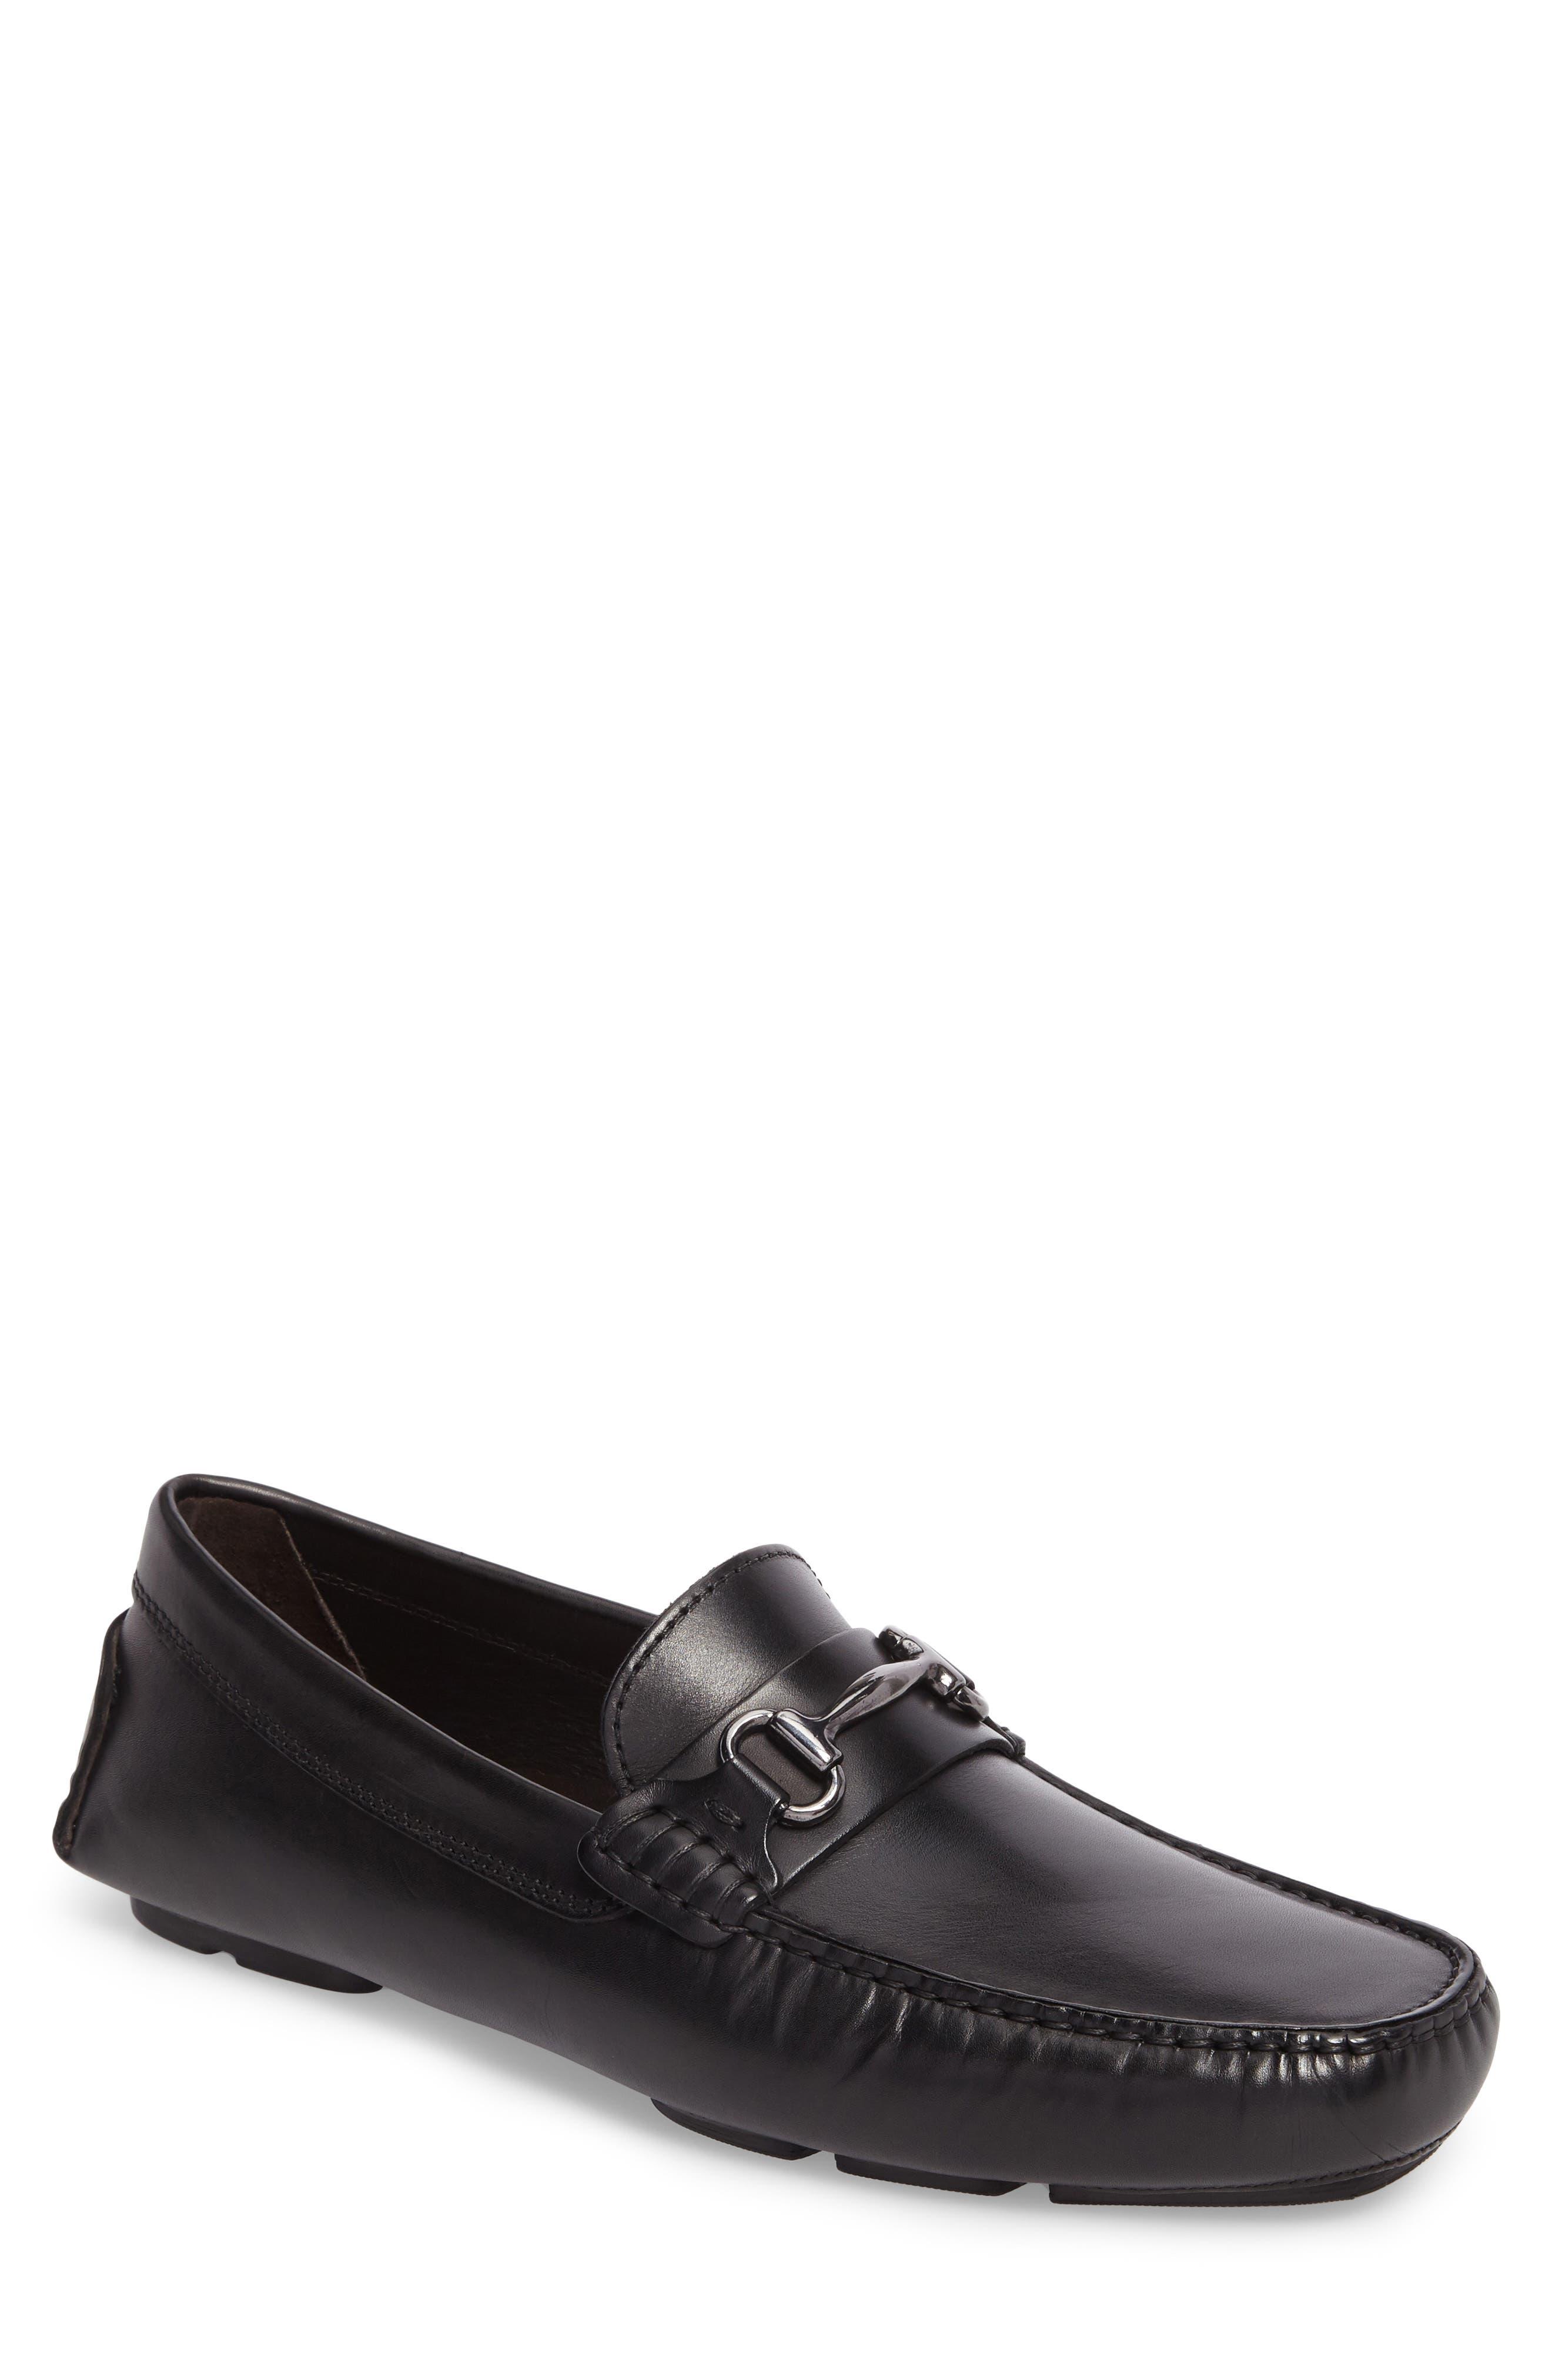 TO BOOT NEW YORK Del Amo Driving Shoe, Main, color, BLACK